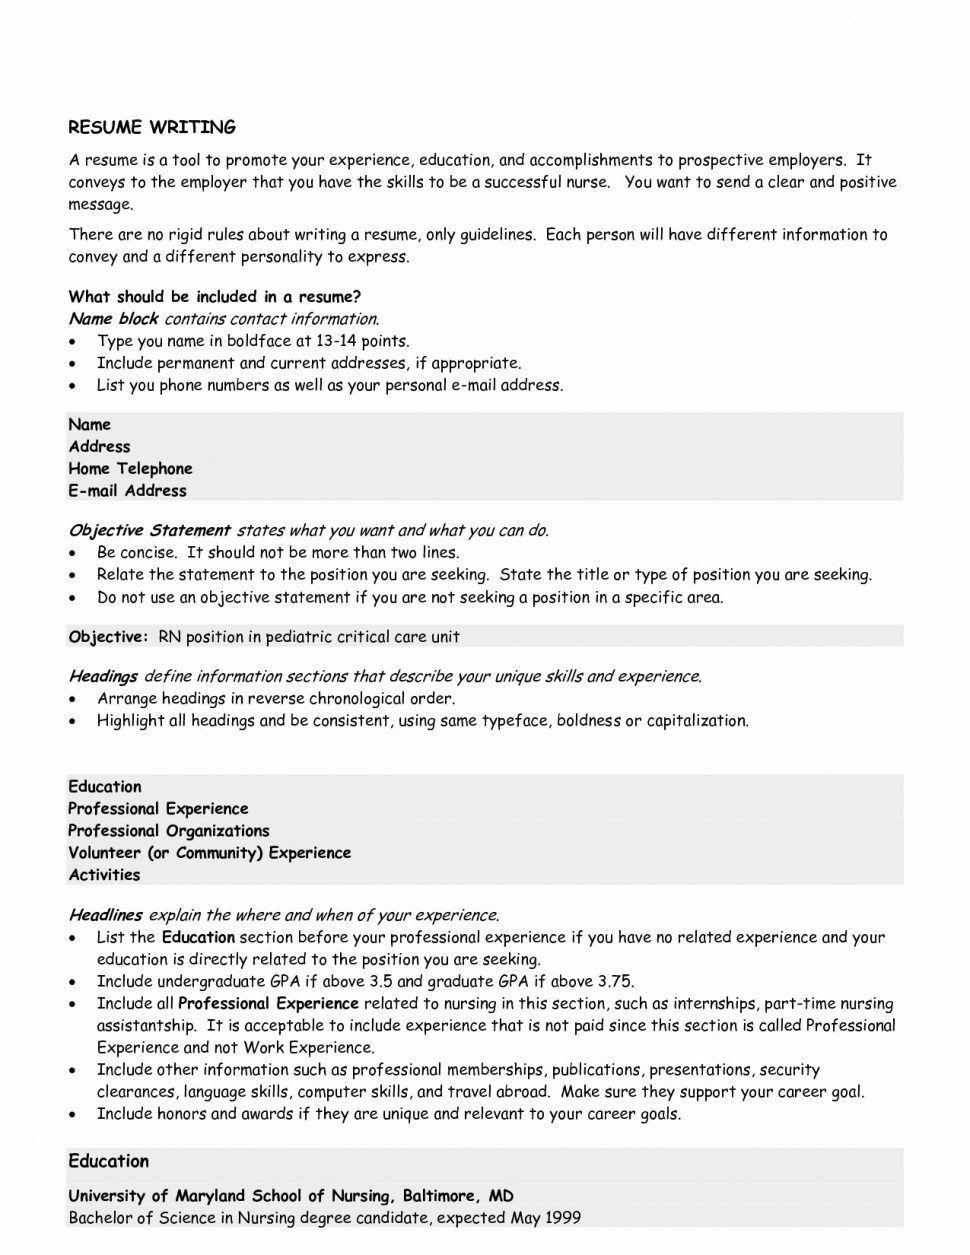 Nova Hunting The Elements Worksheet Pin Di Resume Templates Resume Objective Statement Resume Objective Examples Resume Objective